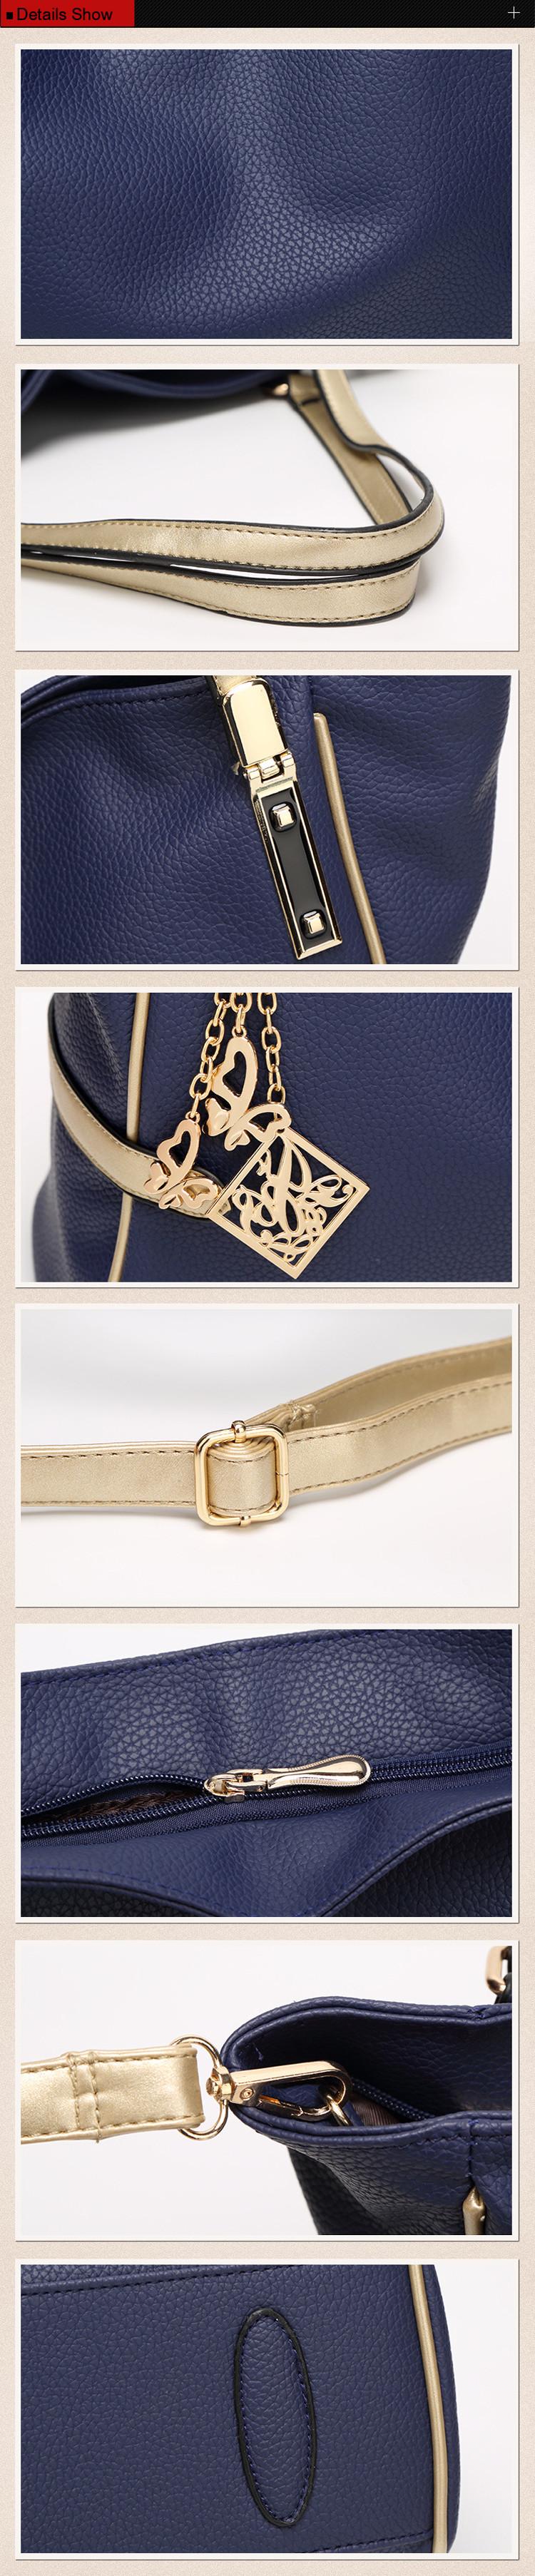 woman-handbag4